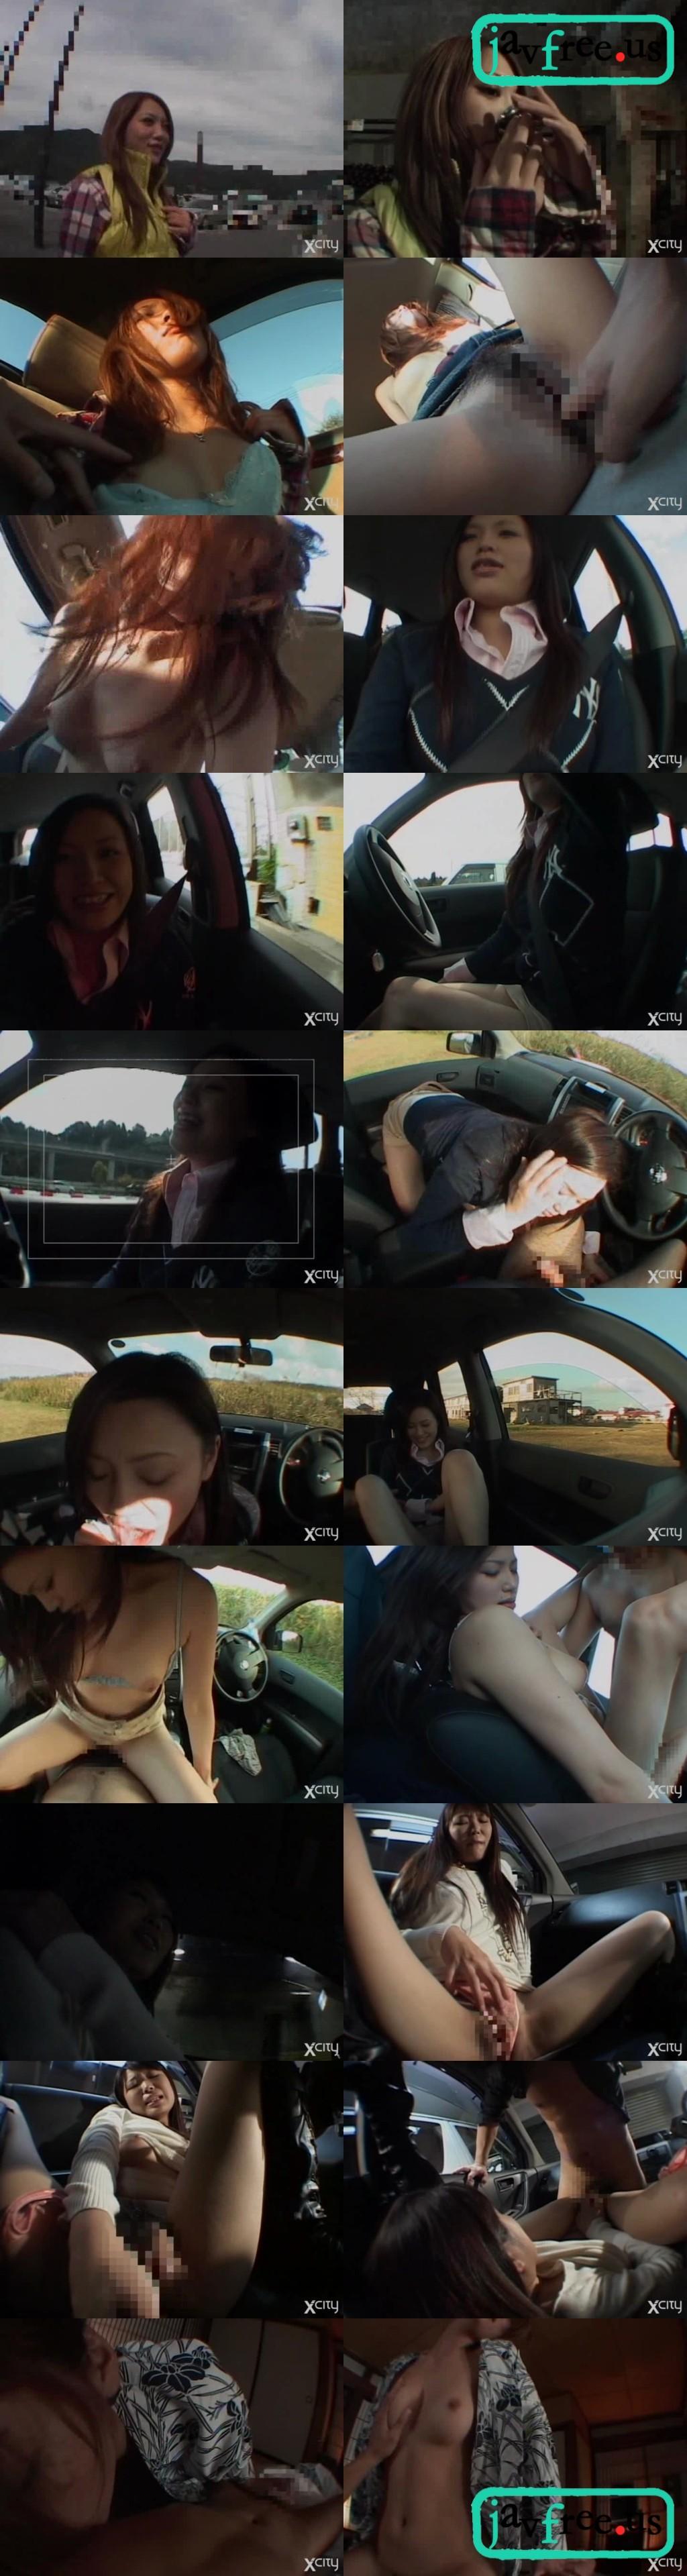 [CAD 1812] Drive 恋撮り CAD